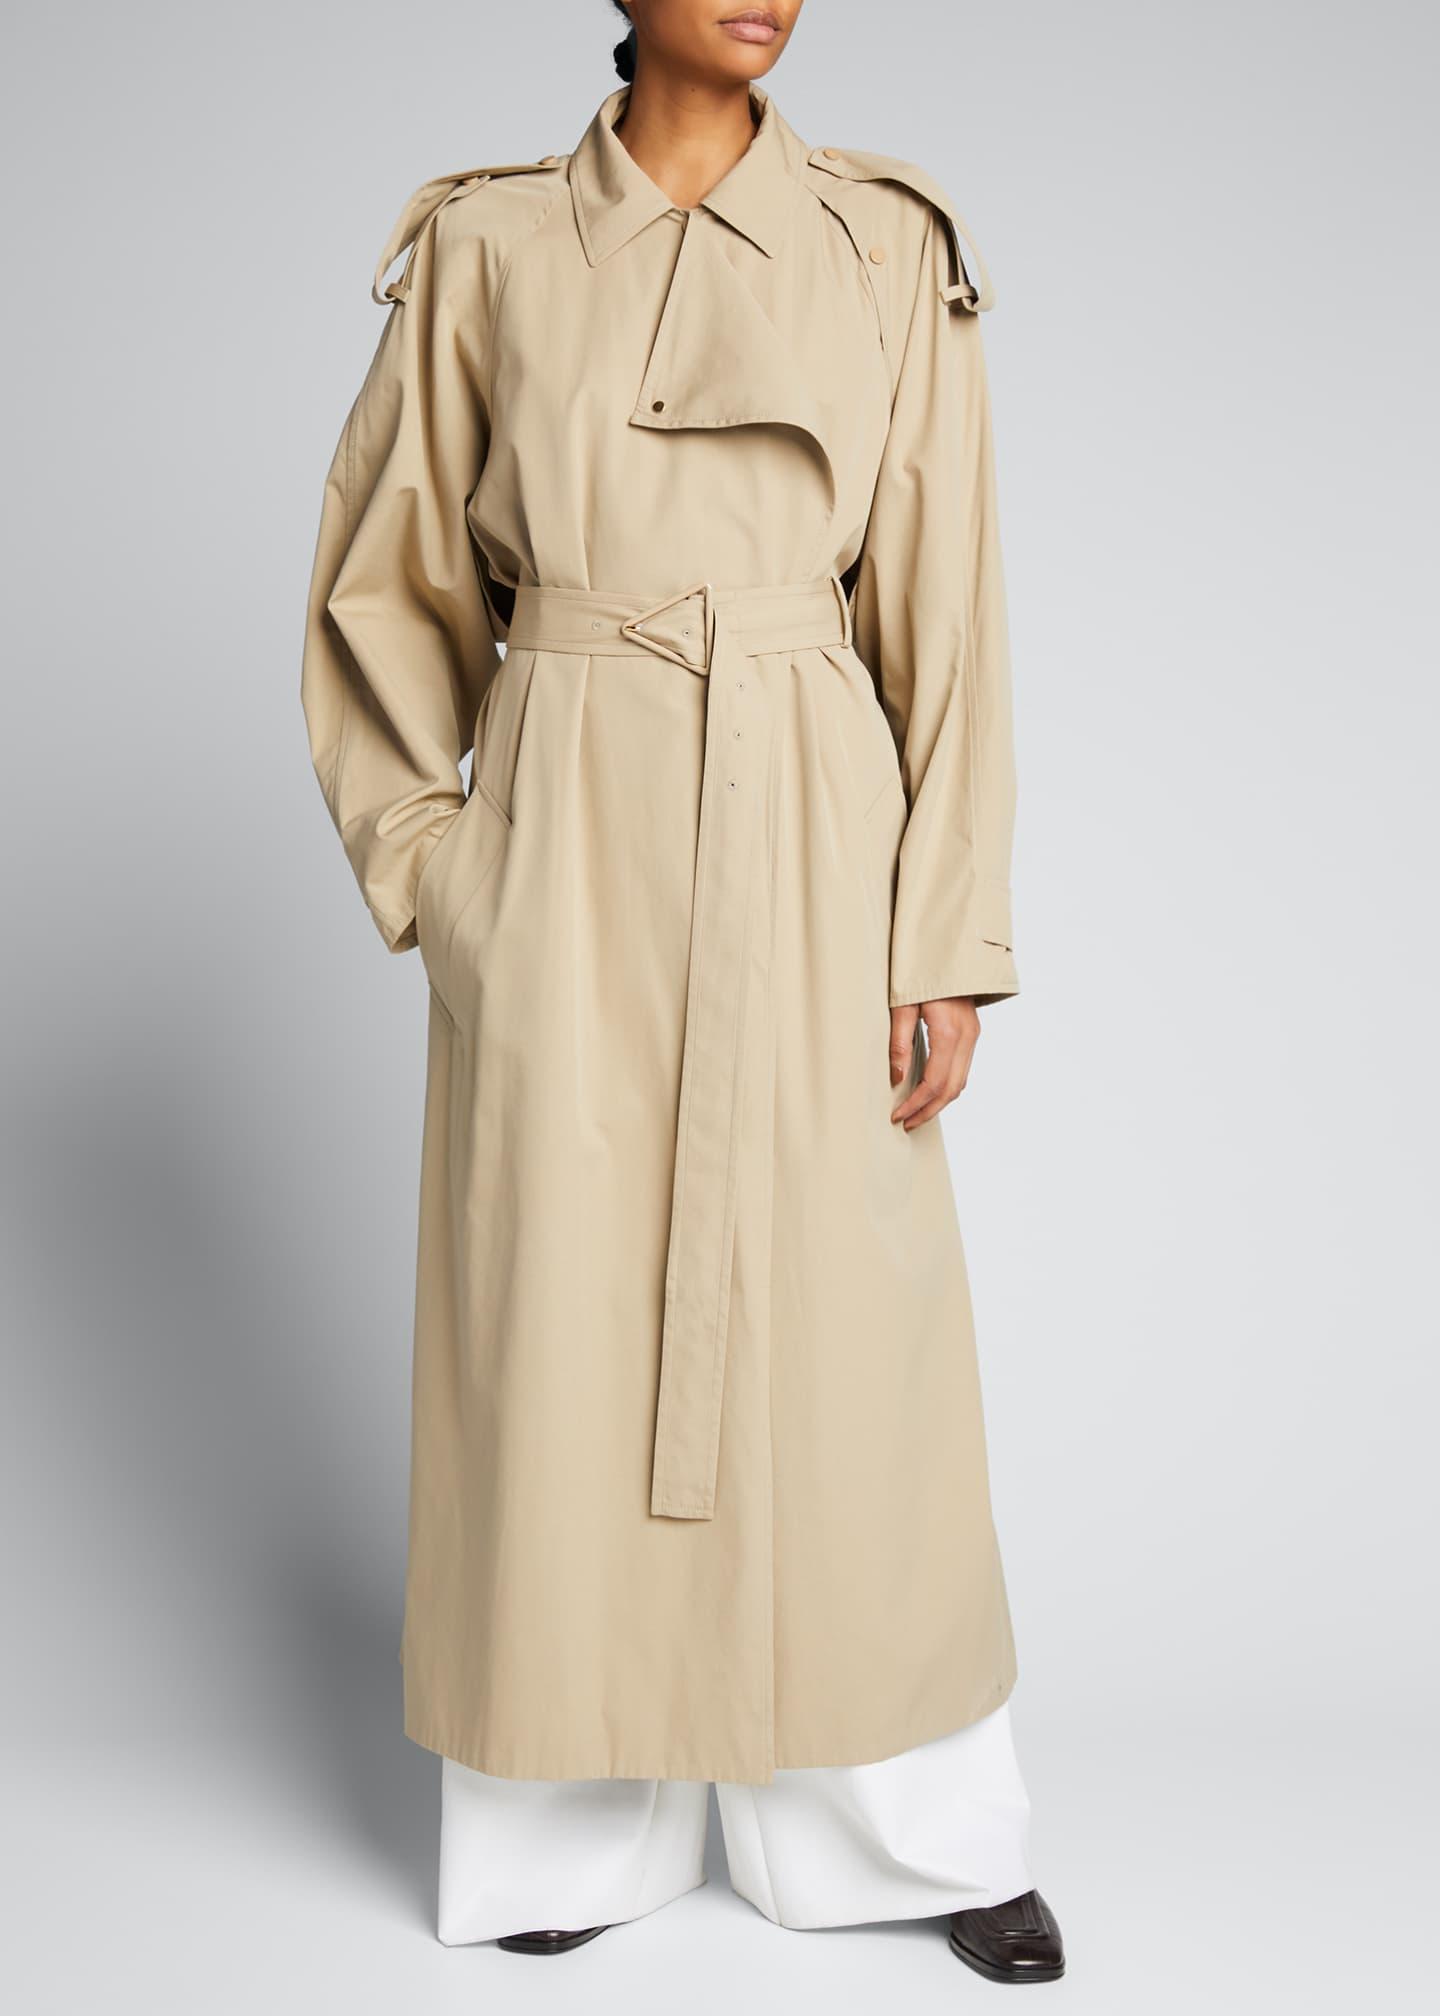 Bottega Veneta Compact Cotton Classic Trench Coat